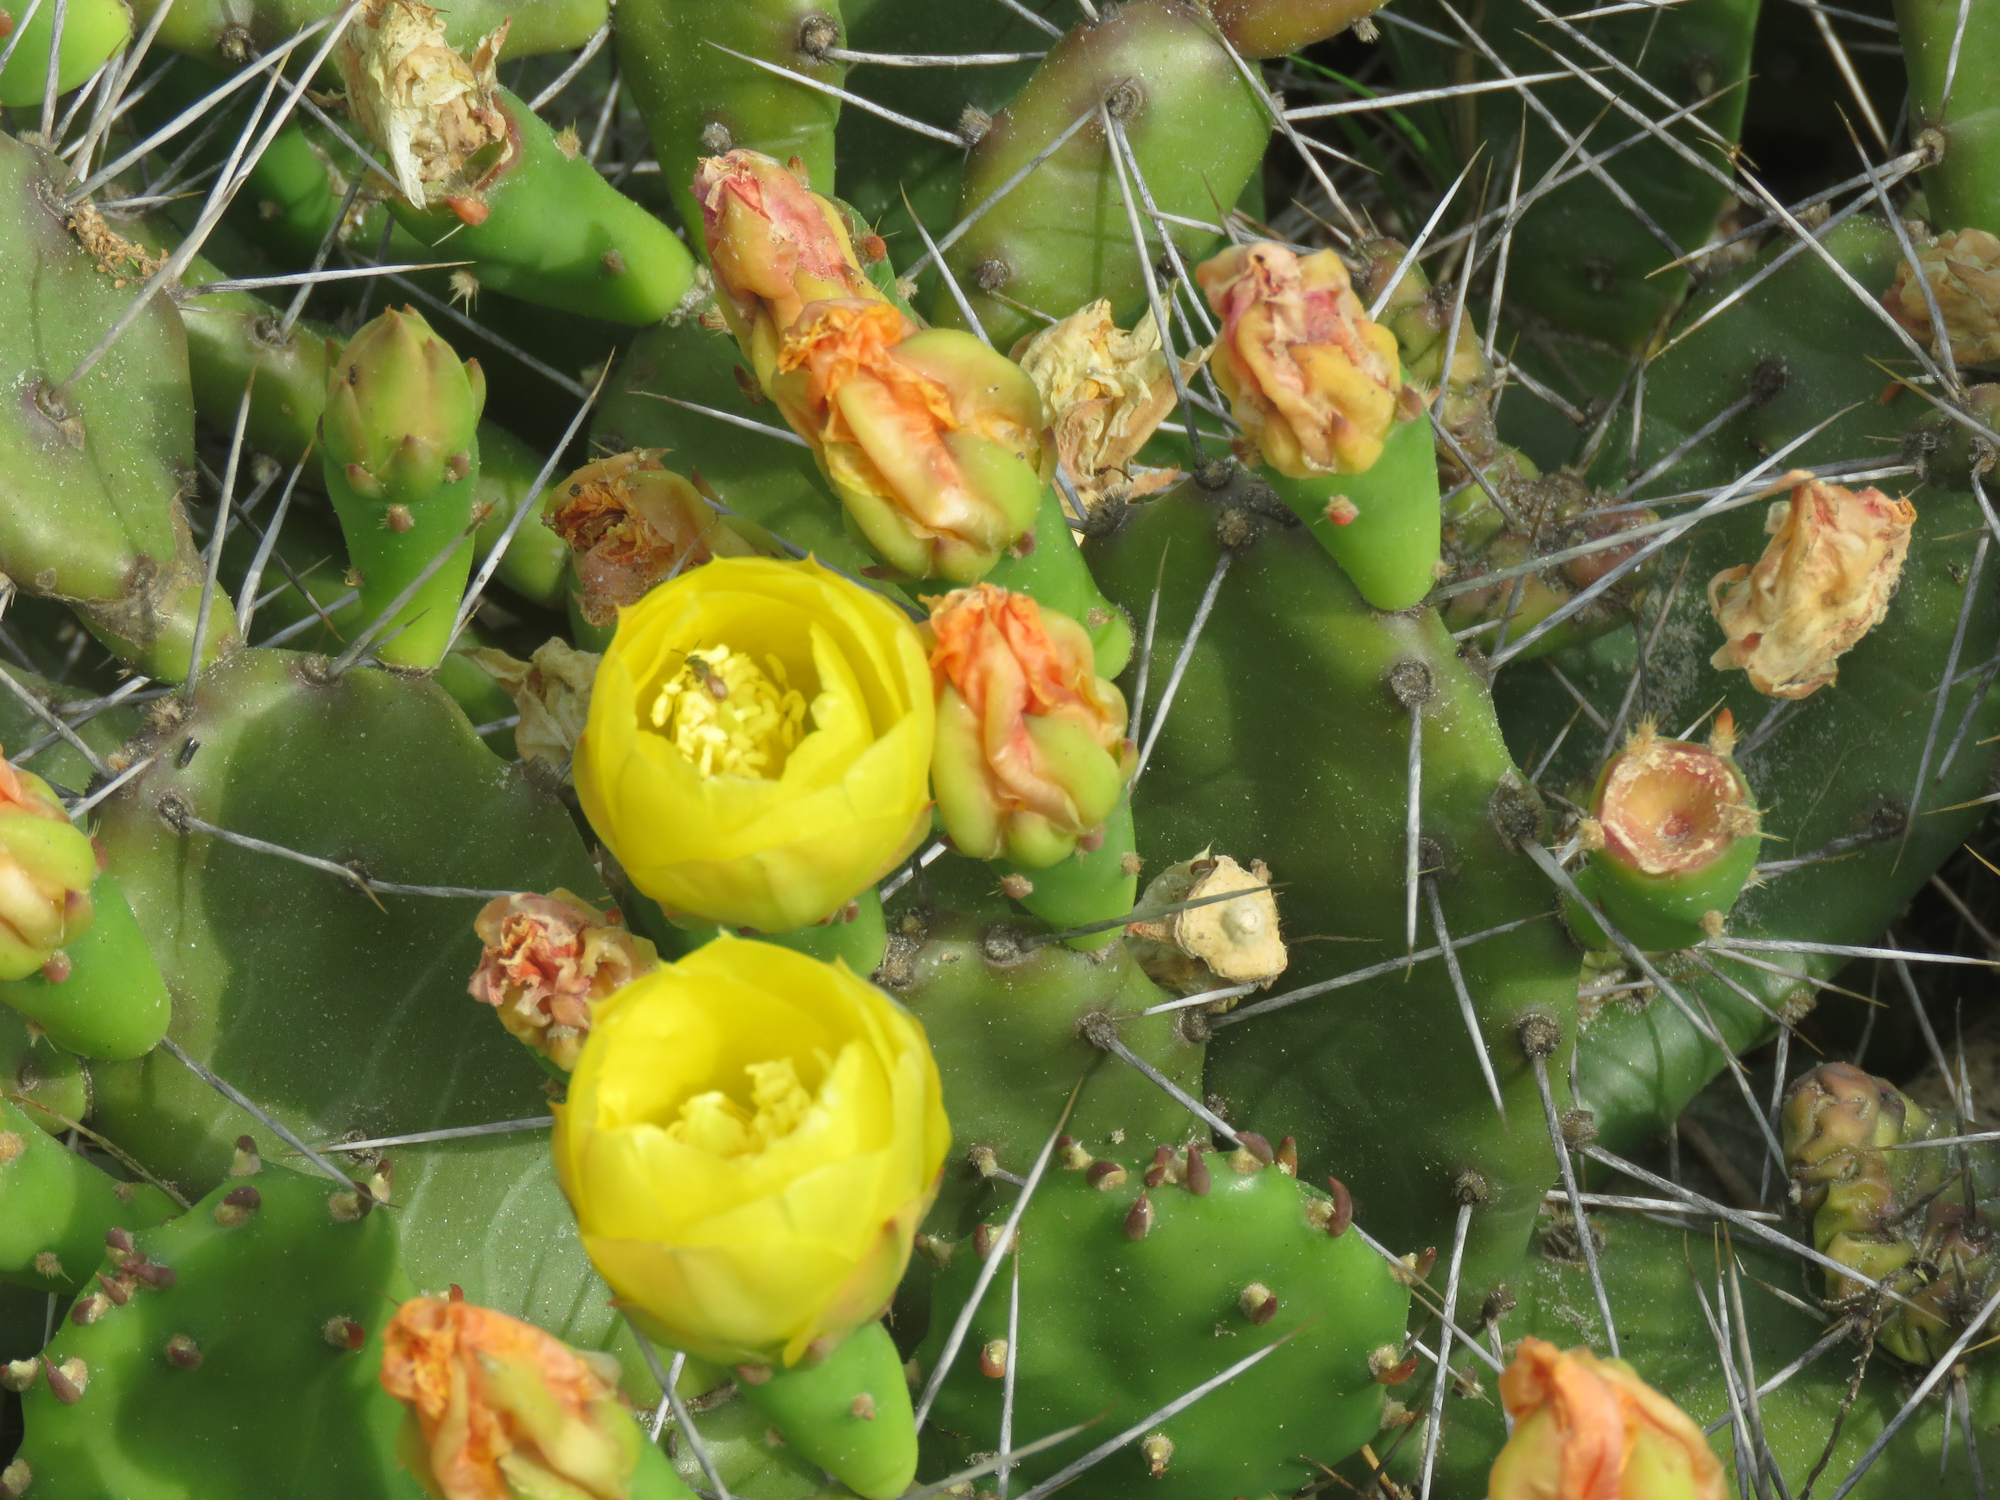 Prickly Pear Cactus boasts Abundant Pollinators and Sharp Spines!